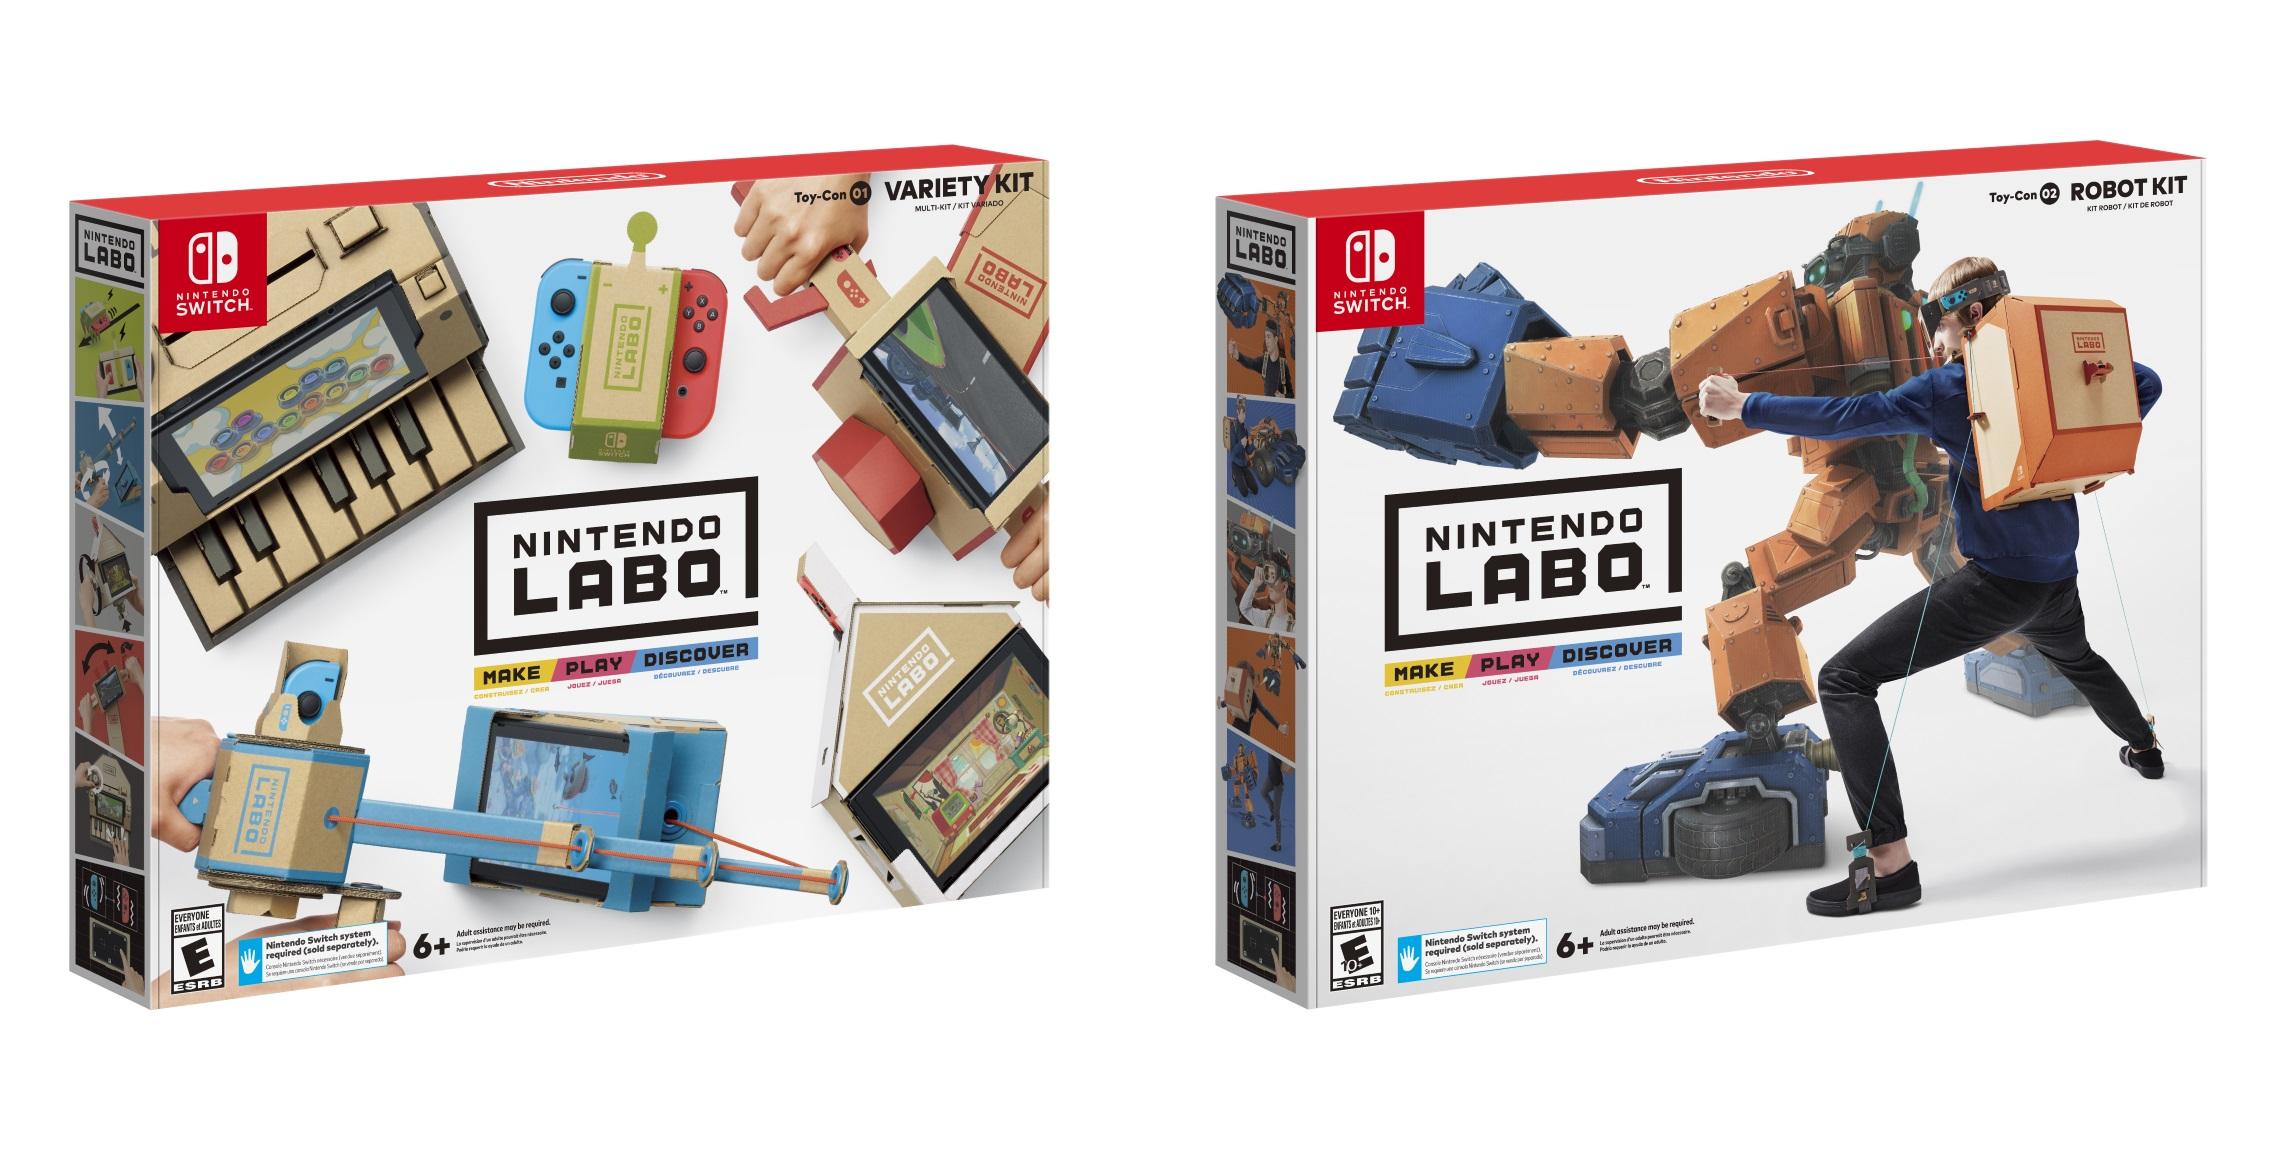 Nintendo Switch Build Cost